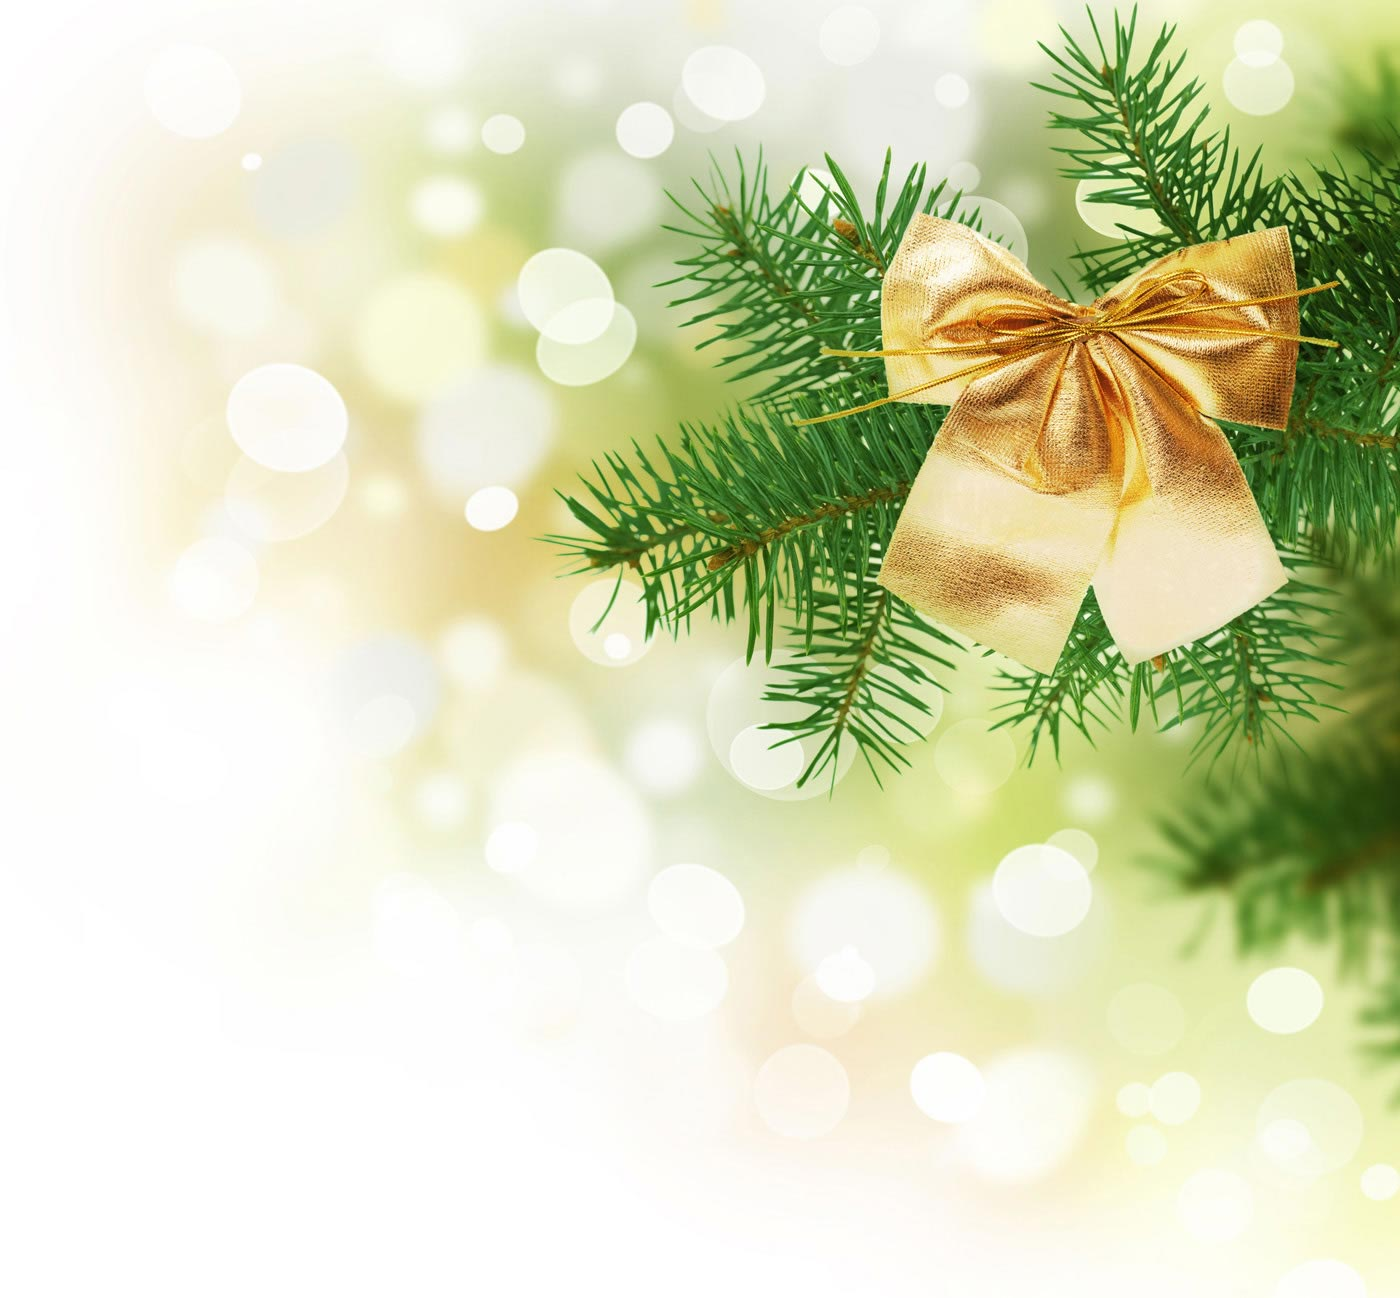 Sfondi Natalizi Jpg.Sfondi Natale Sfondo Desktop Di Natale